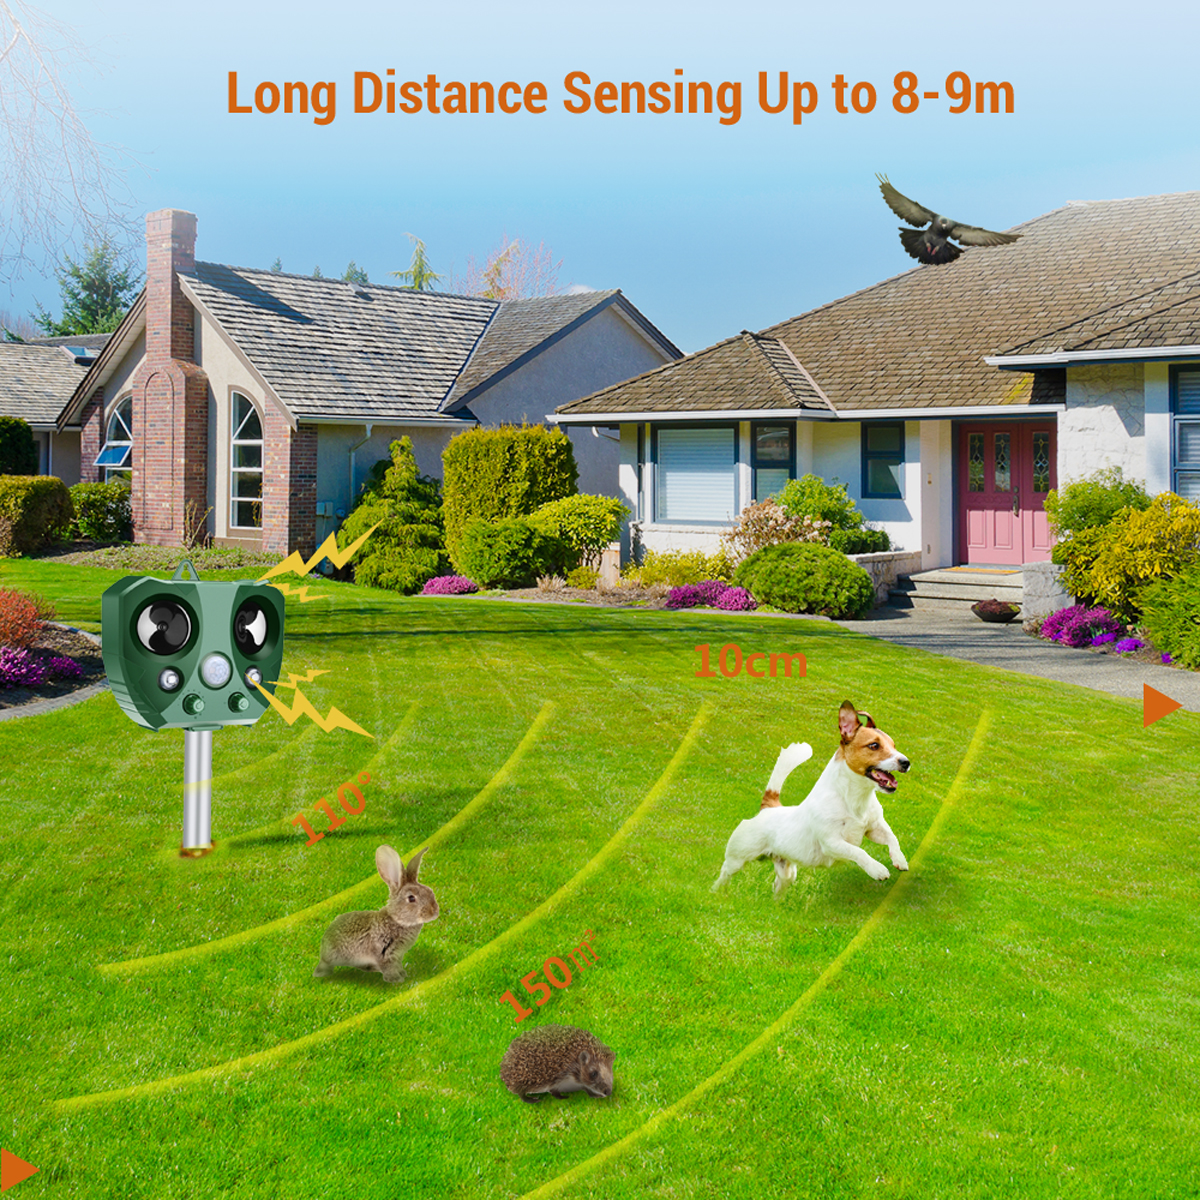 Solar Outdoor Pest Animal Repeller Pir Motion Sensor